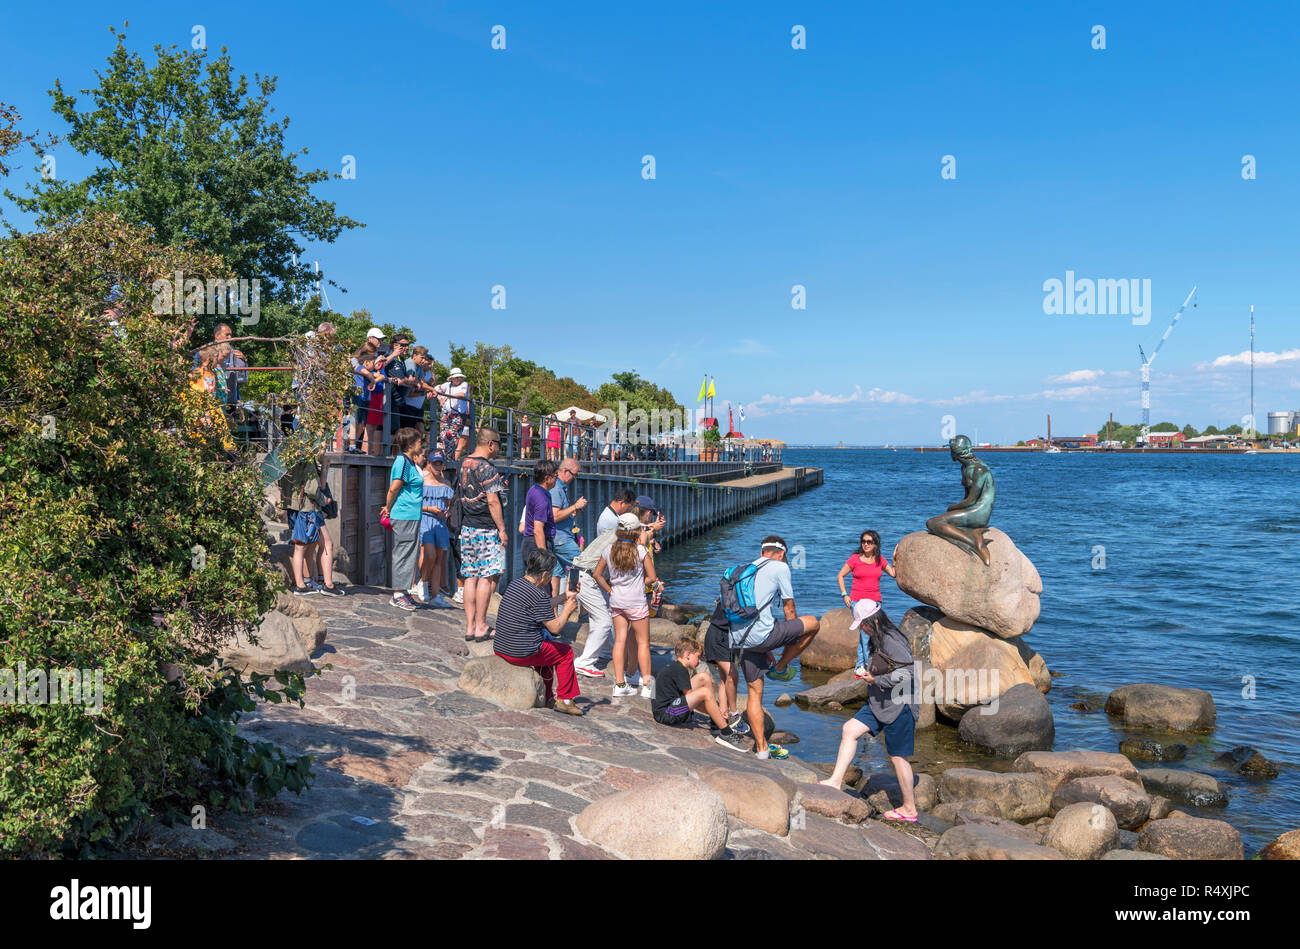 Tourists posing for pictures by The Little Mermaid (Den lille Havfrue), Copenhagen, Denmark - Stock Image